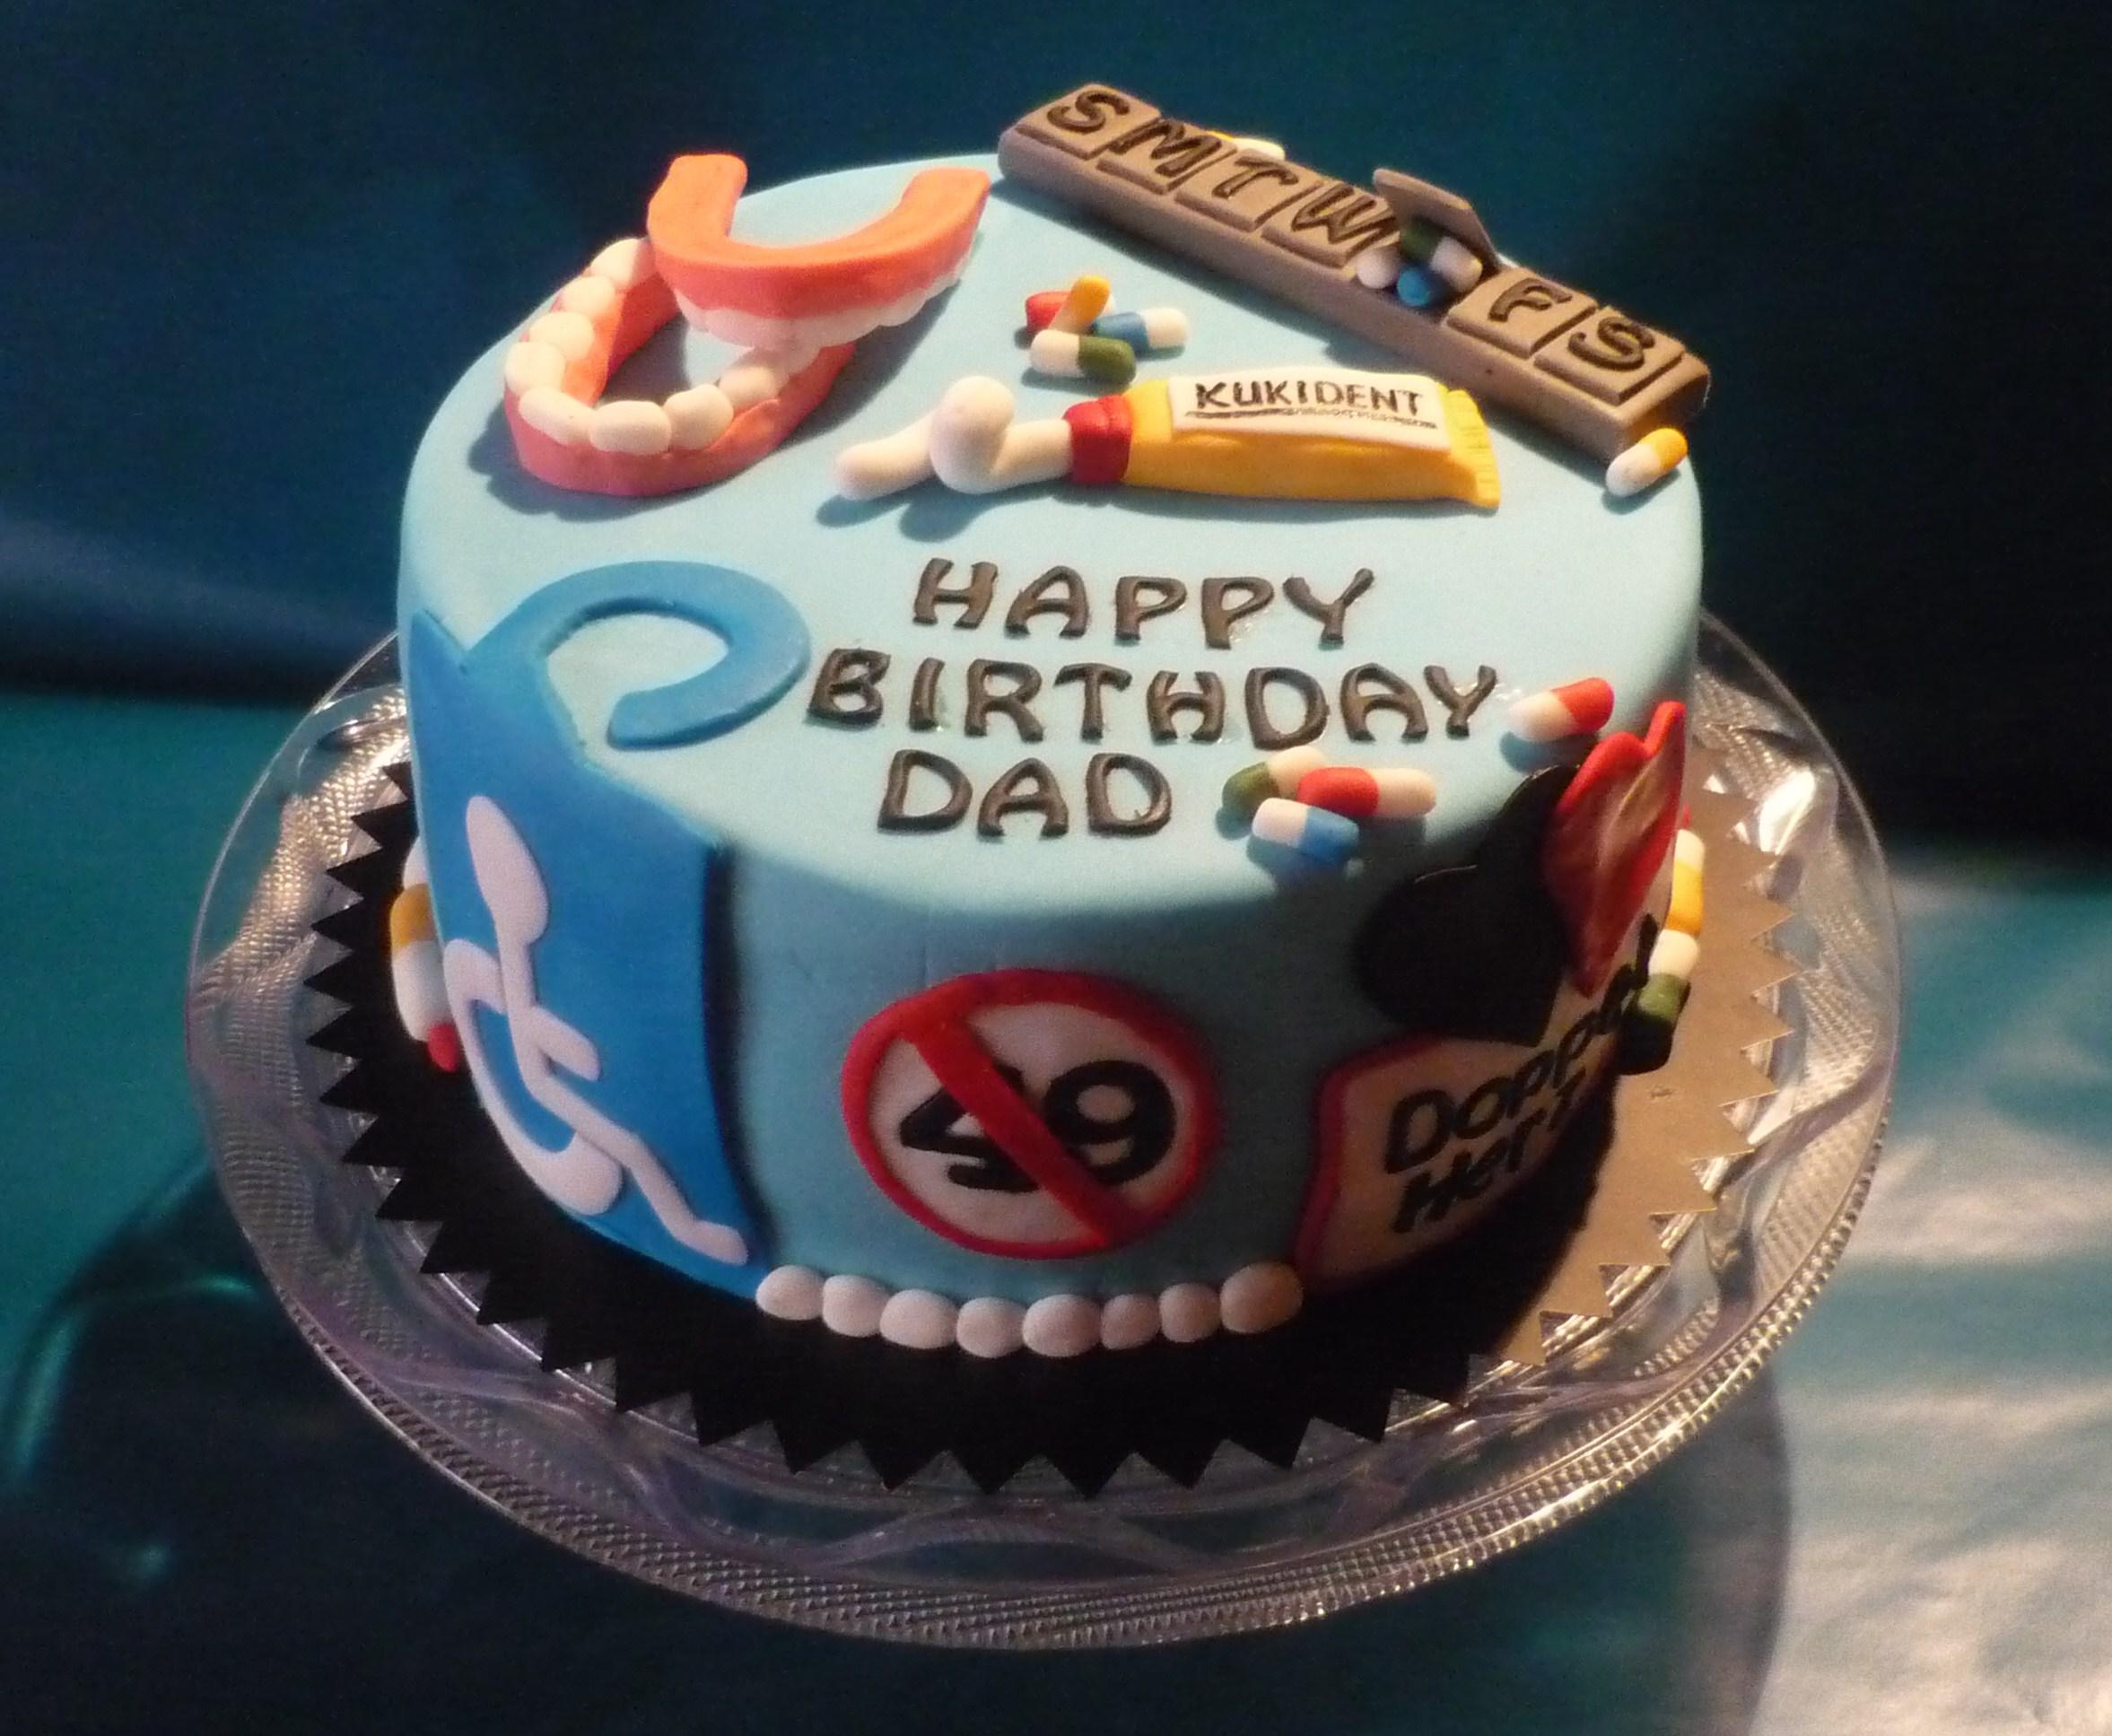 Tremendous 9 Funny 50Th Birthday Cakes Mens Photo Funny 50Th Birthday Cake Personalised Birthday Cards Arneslily Jamesorg